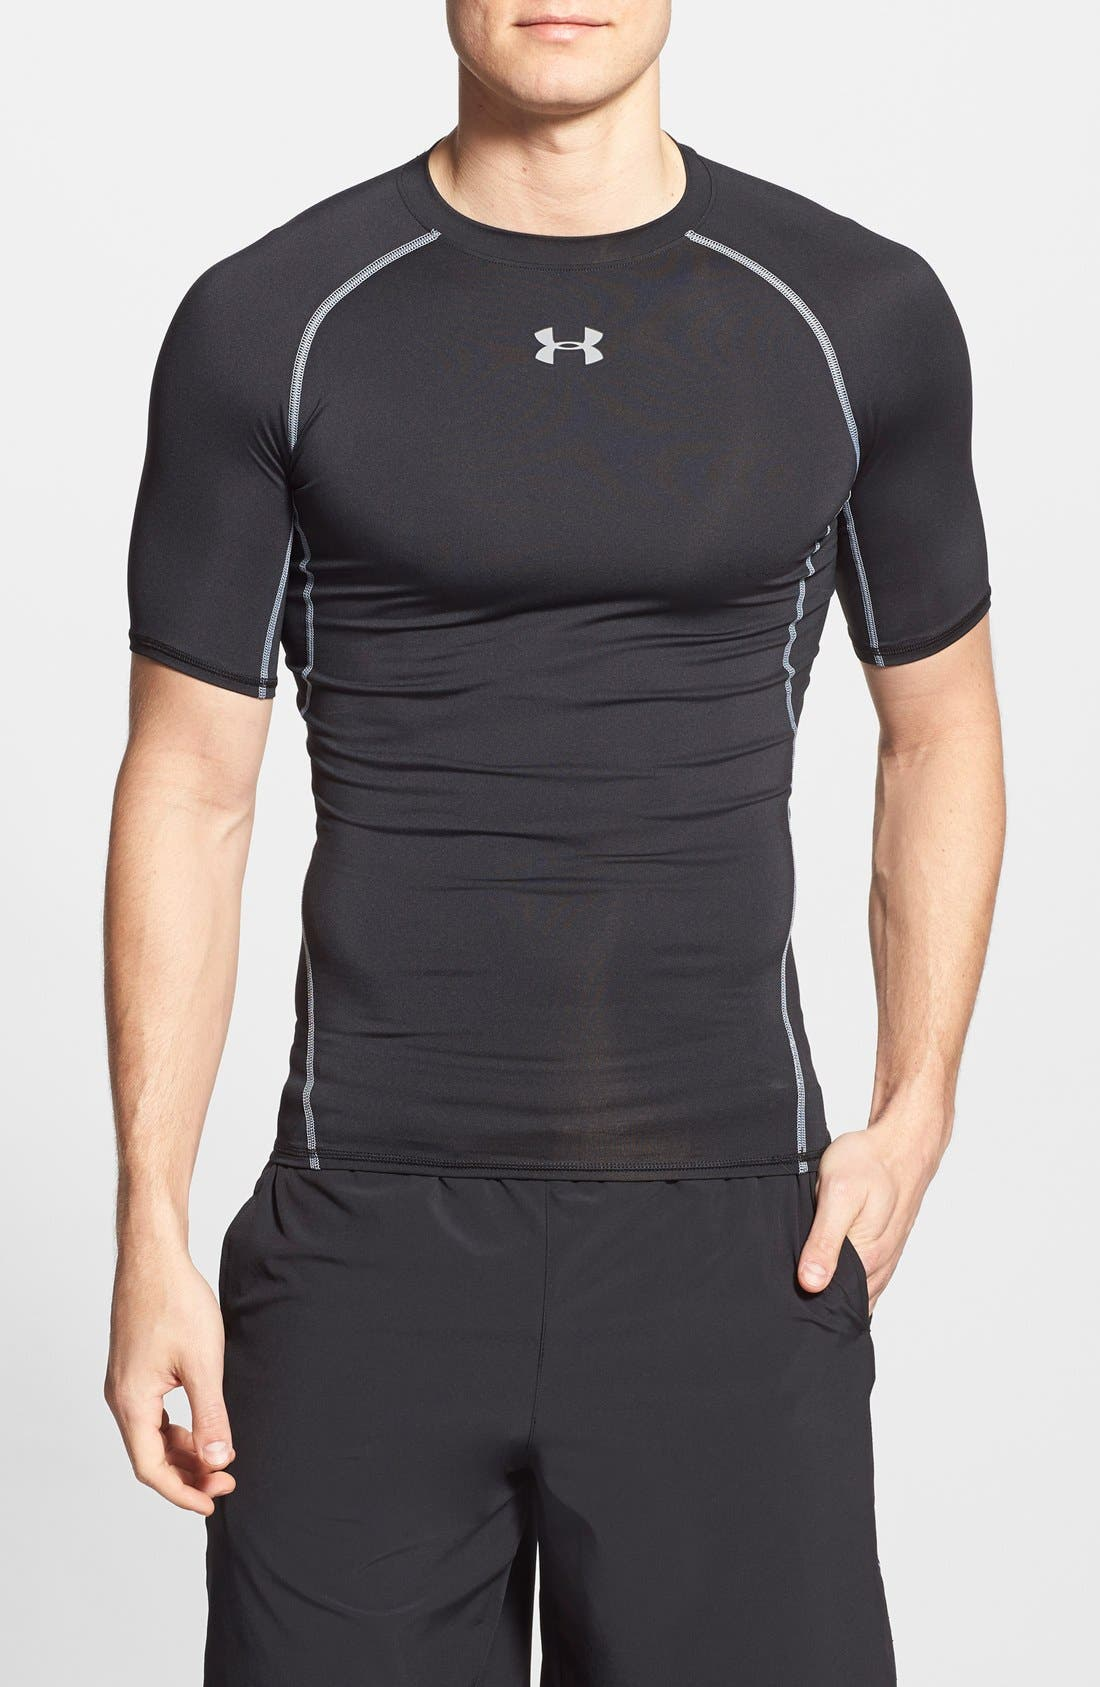 Under Armour HeatGear® Compression Fit T-Shirt